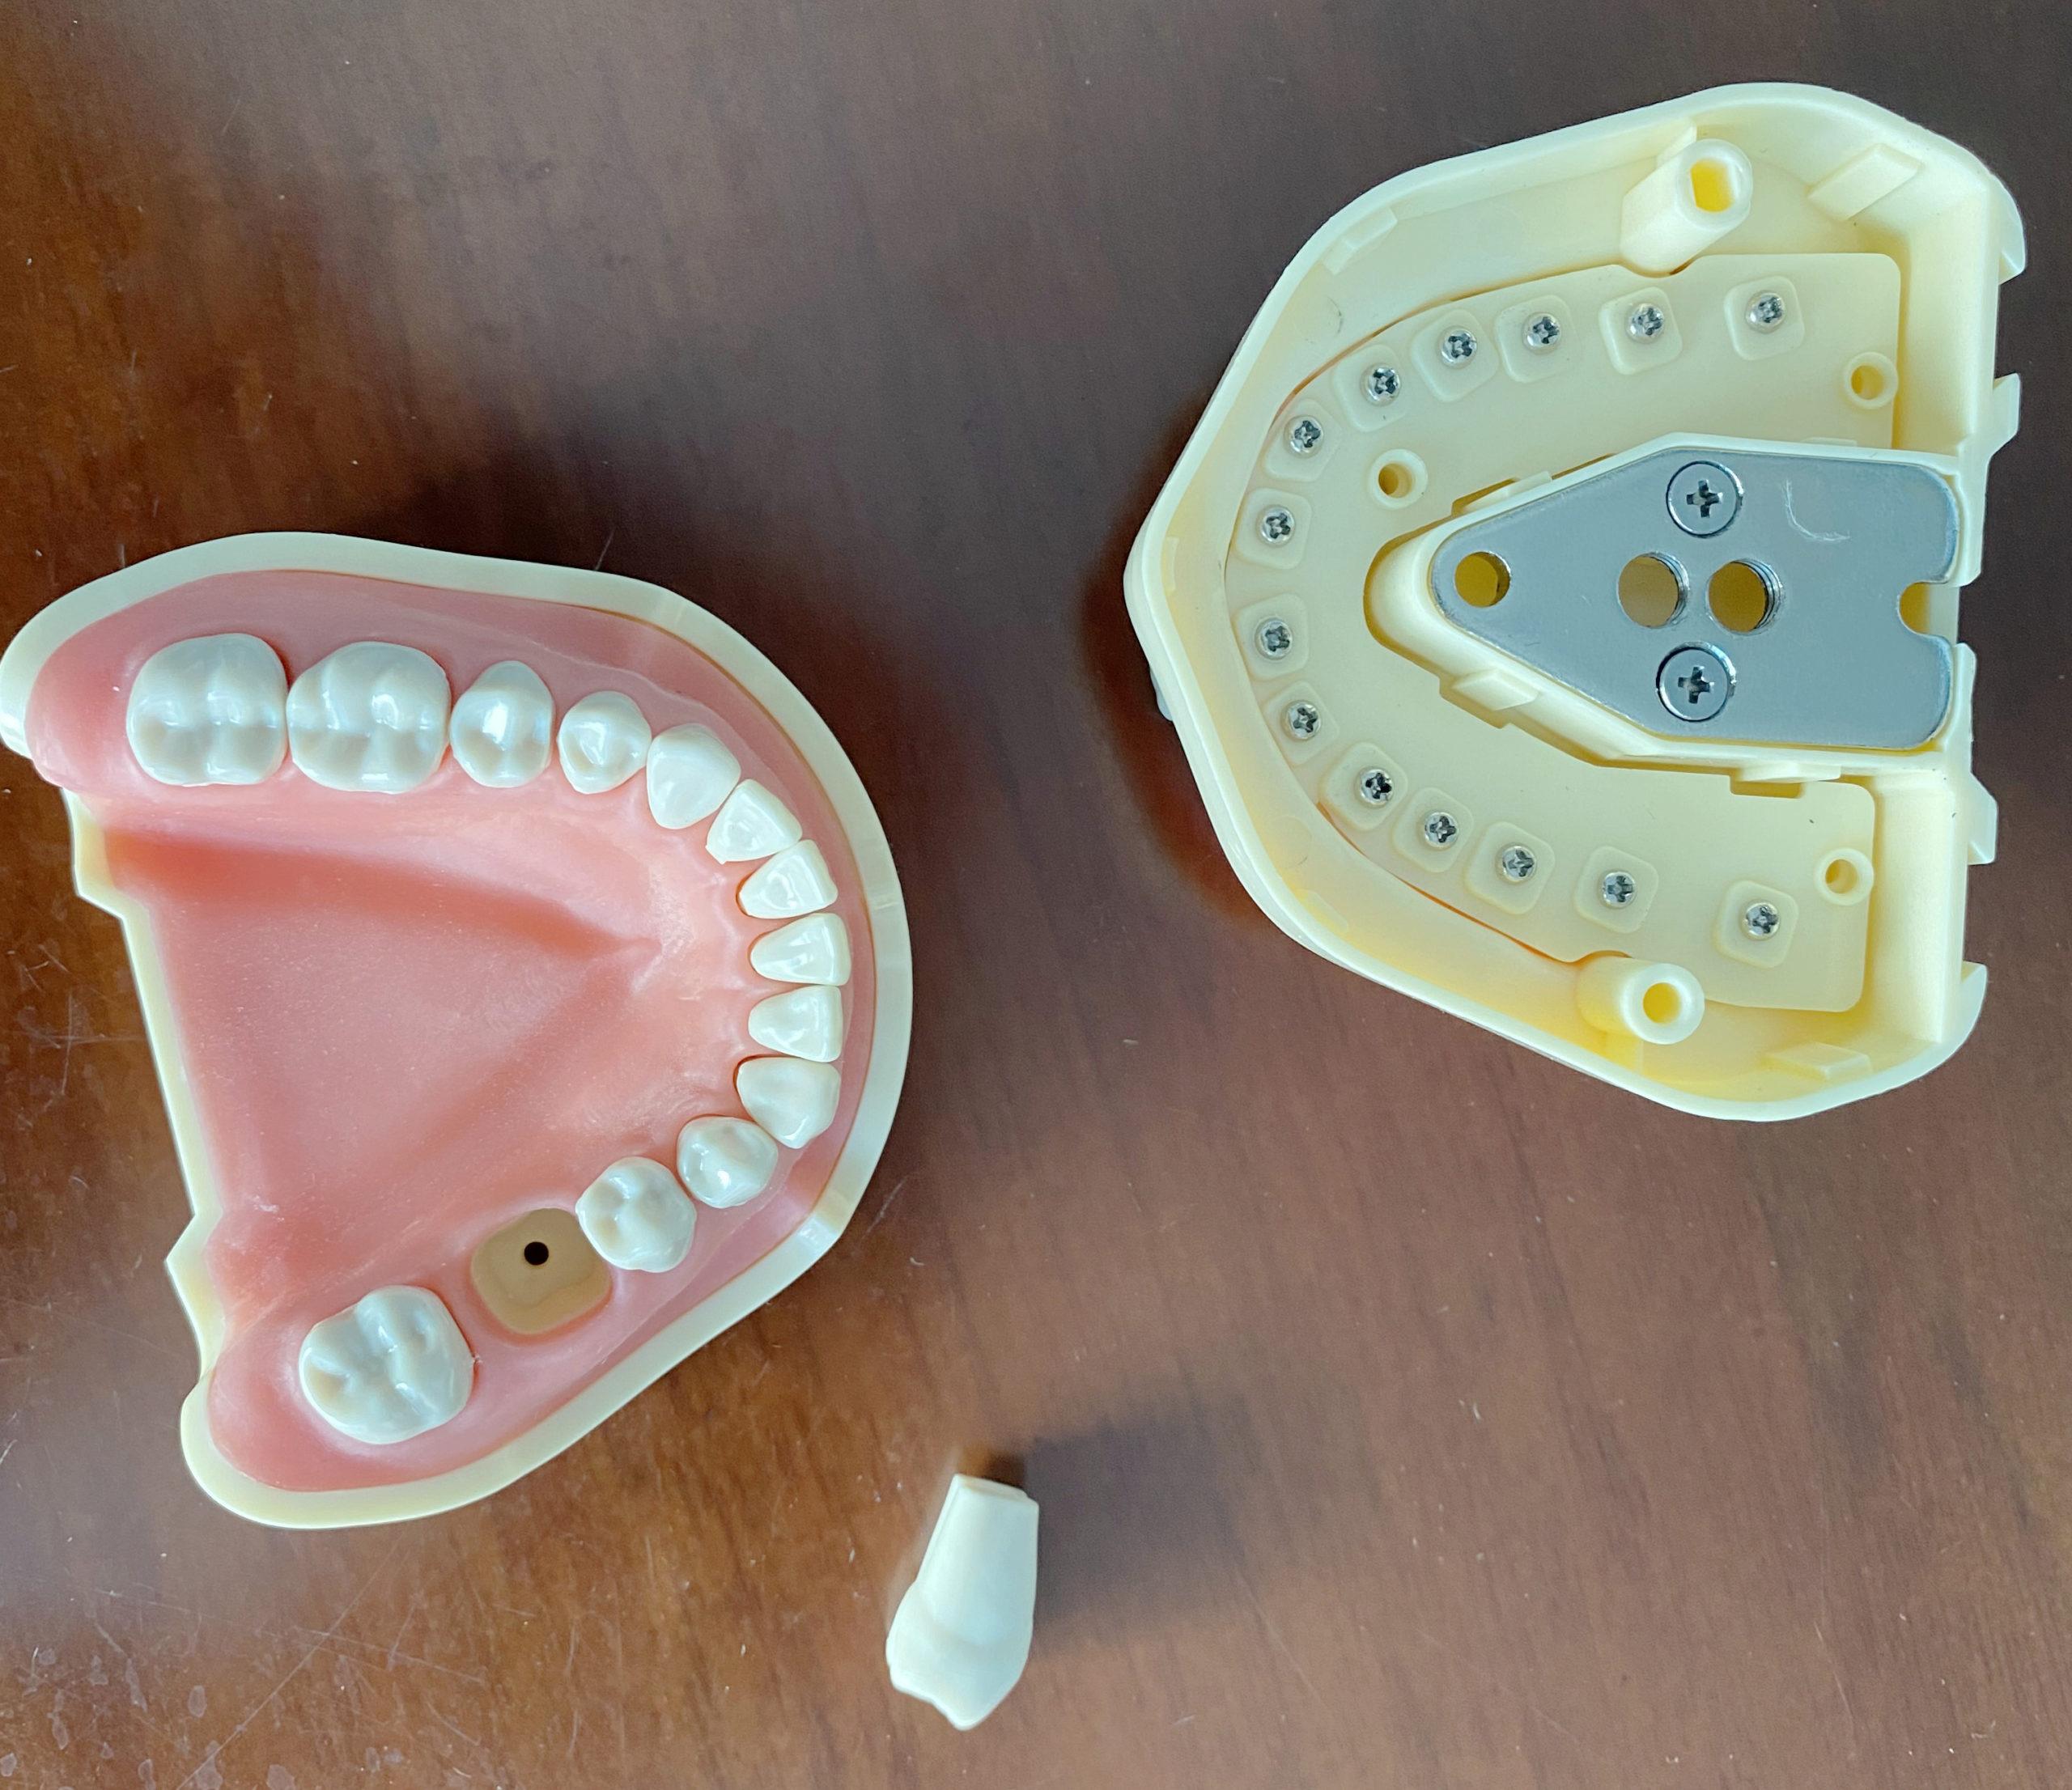 Dental Teeth Model Study And Teach Soft Gum BF Style 28pcs